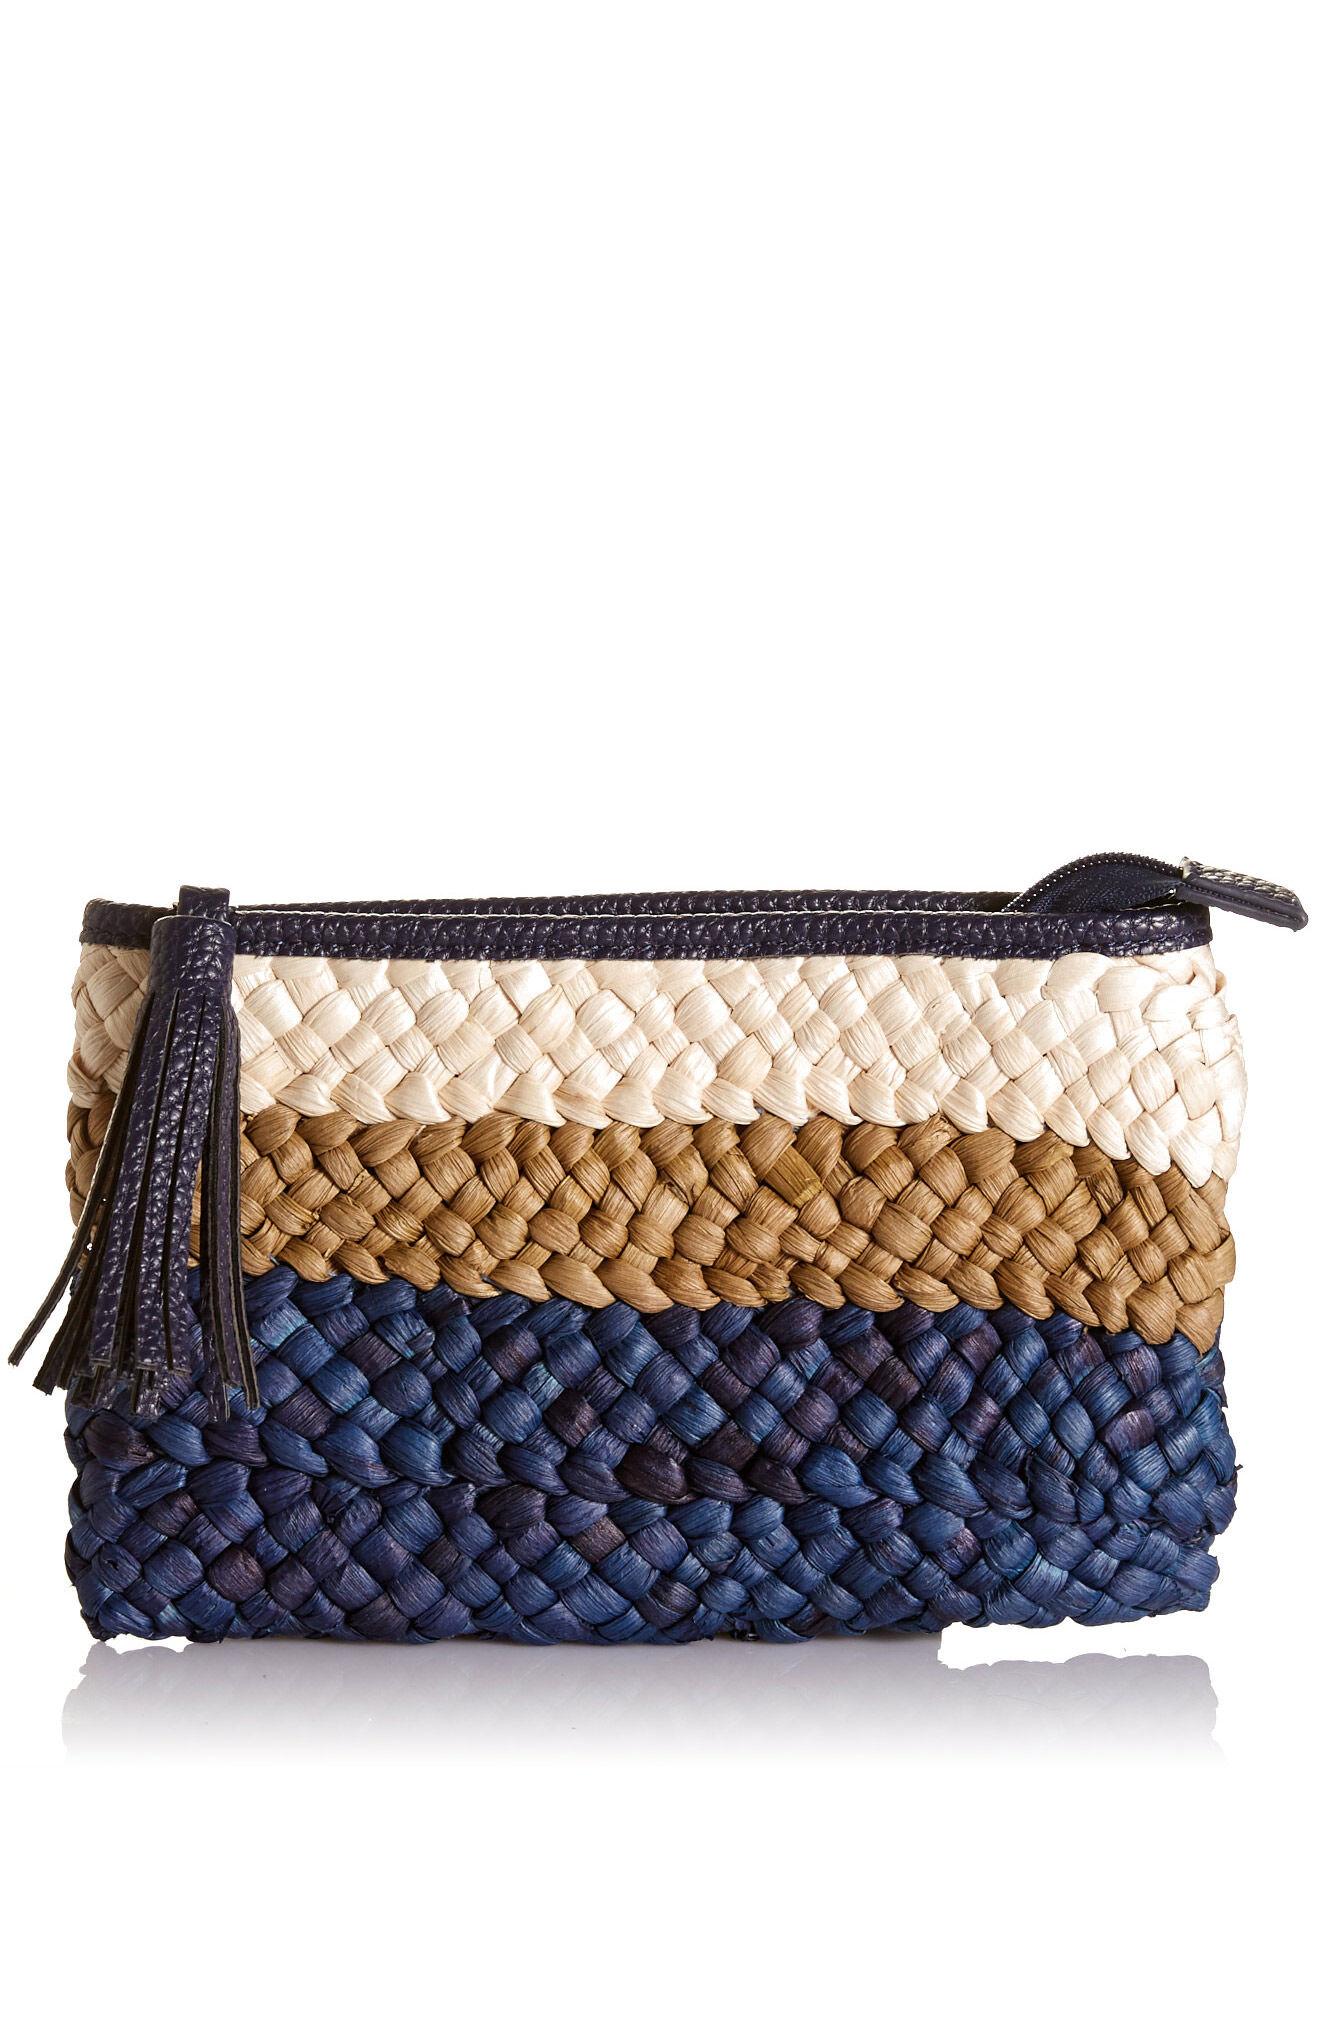 NEW-Sportscraft-WOMENS-Sandy-Woven-Pouch-Women-039-s-Bags